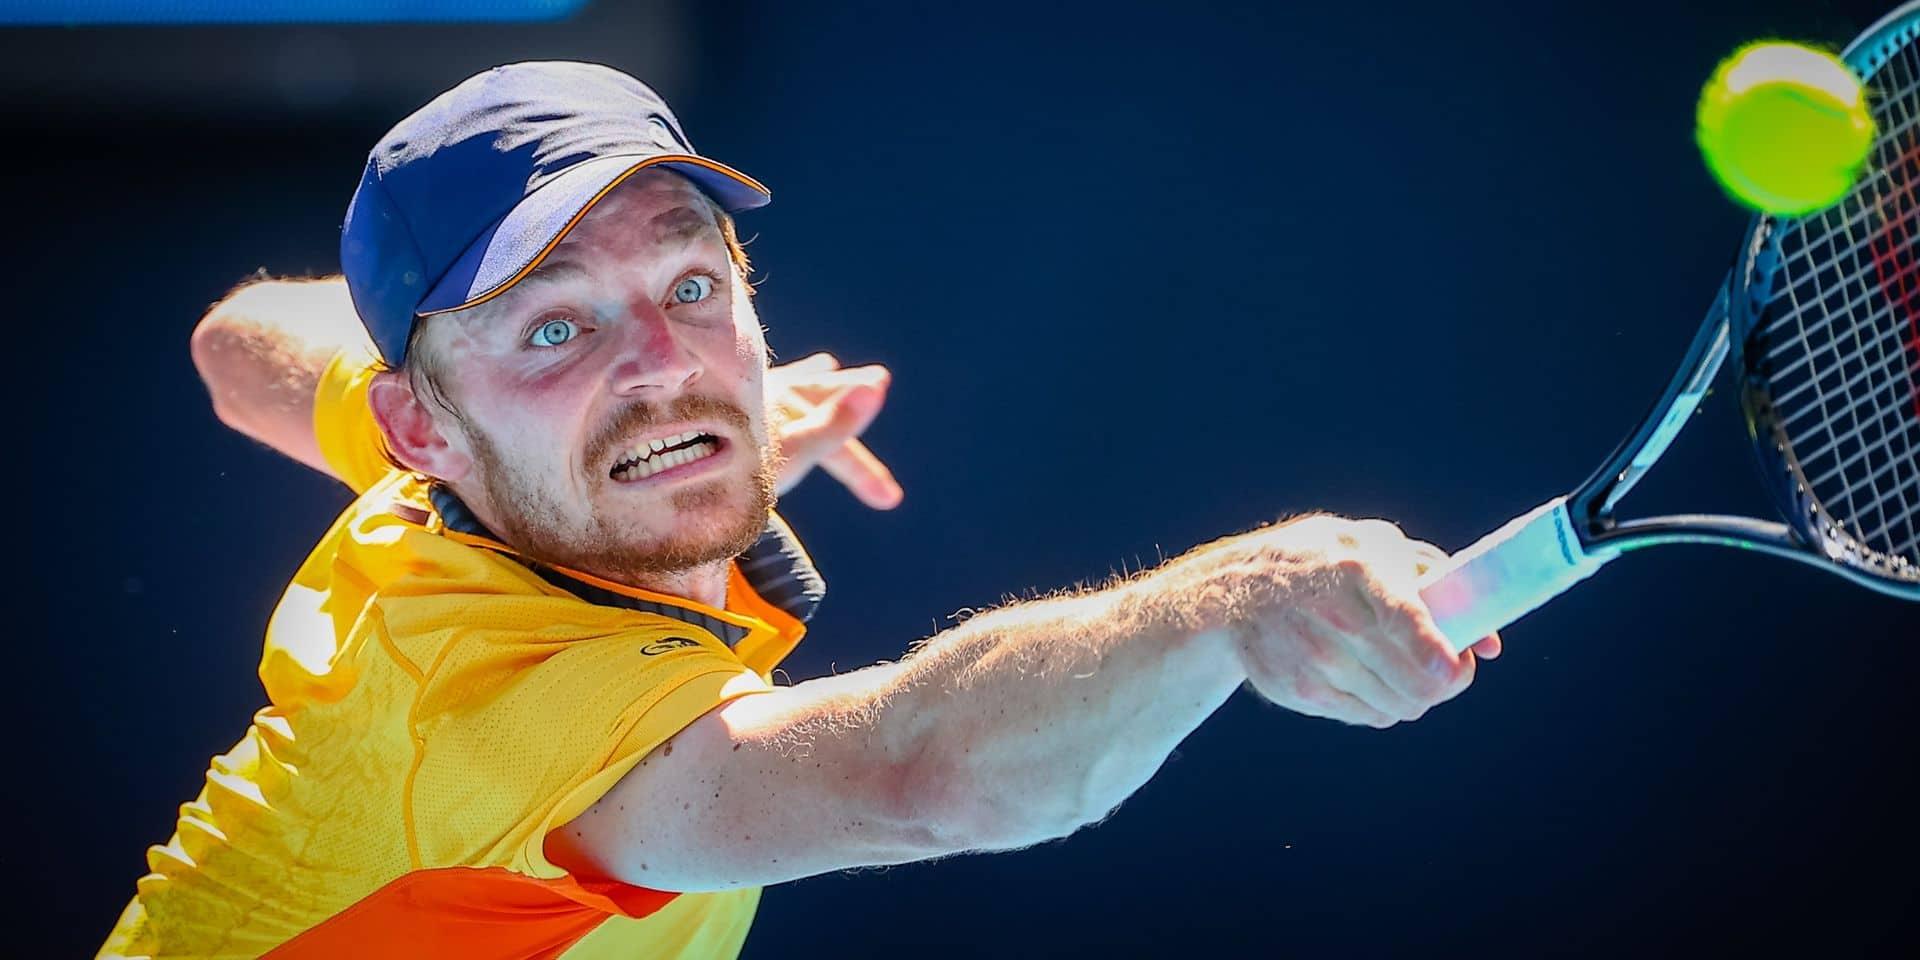 ATP Monte-Carlo: Goffin élimine Zverev en deux sets et affrontera Evans, Nadal étrille Dimitrov